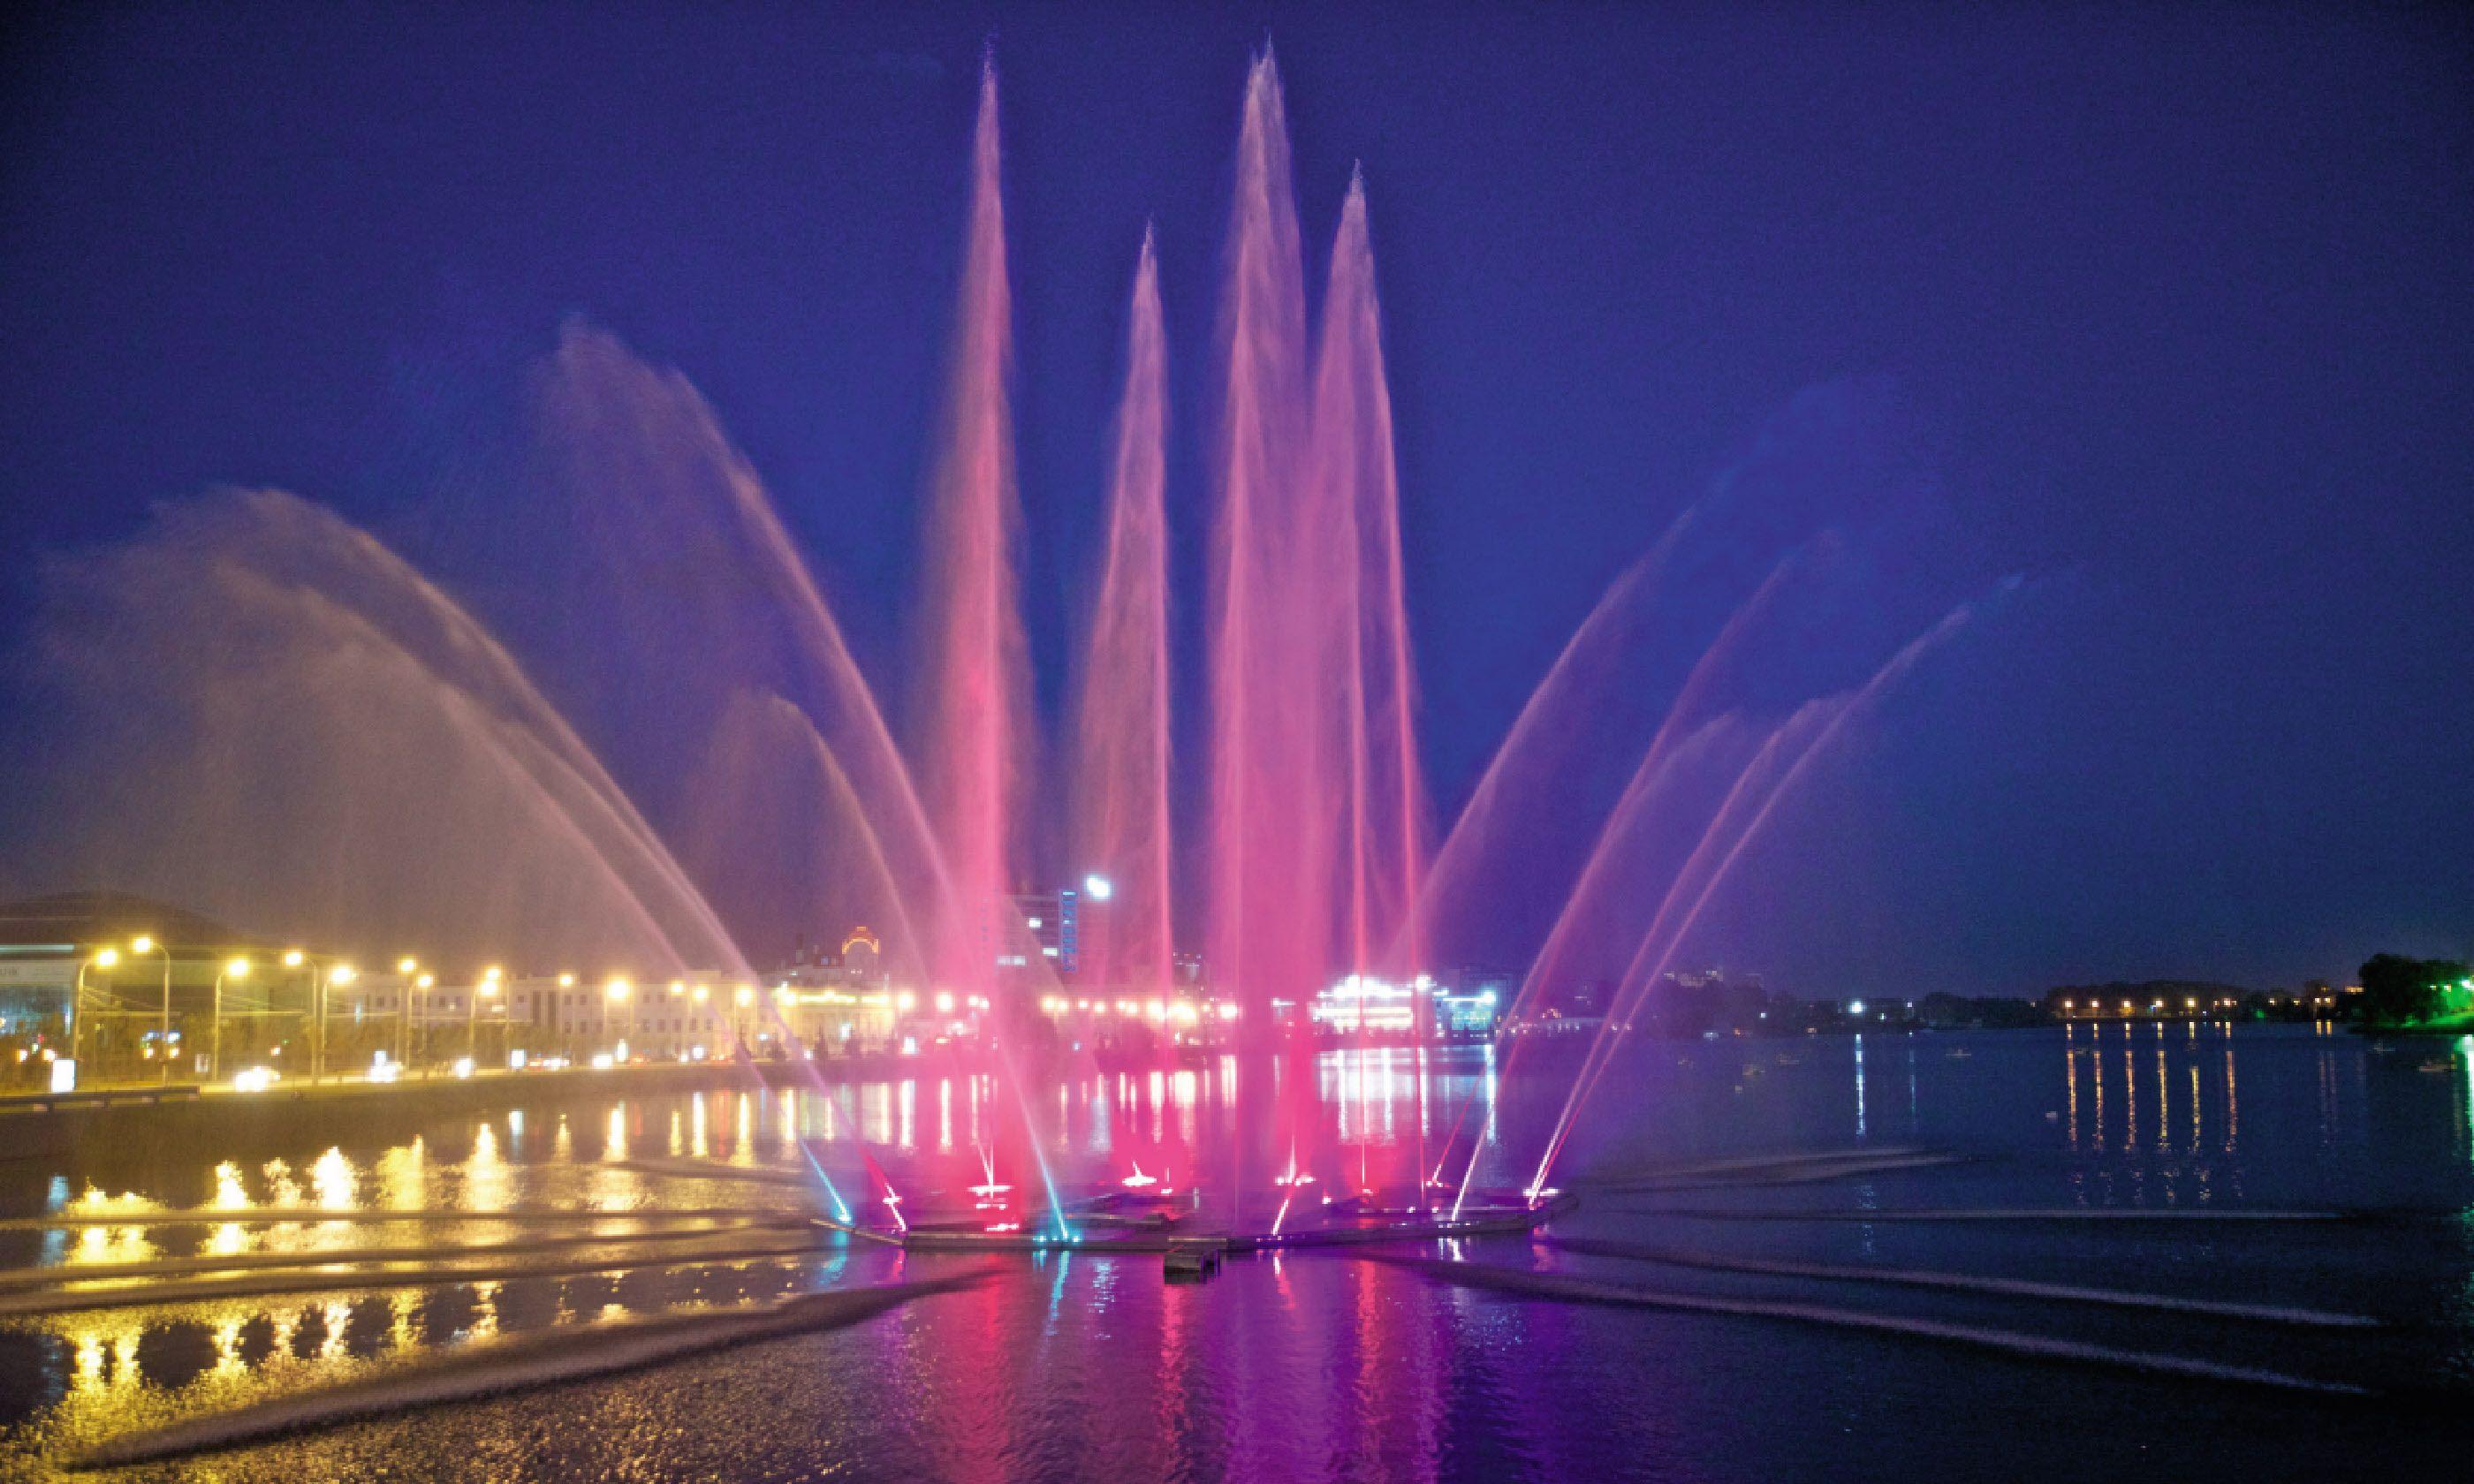 Tatarstan's night fountains